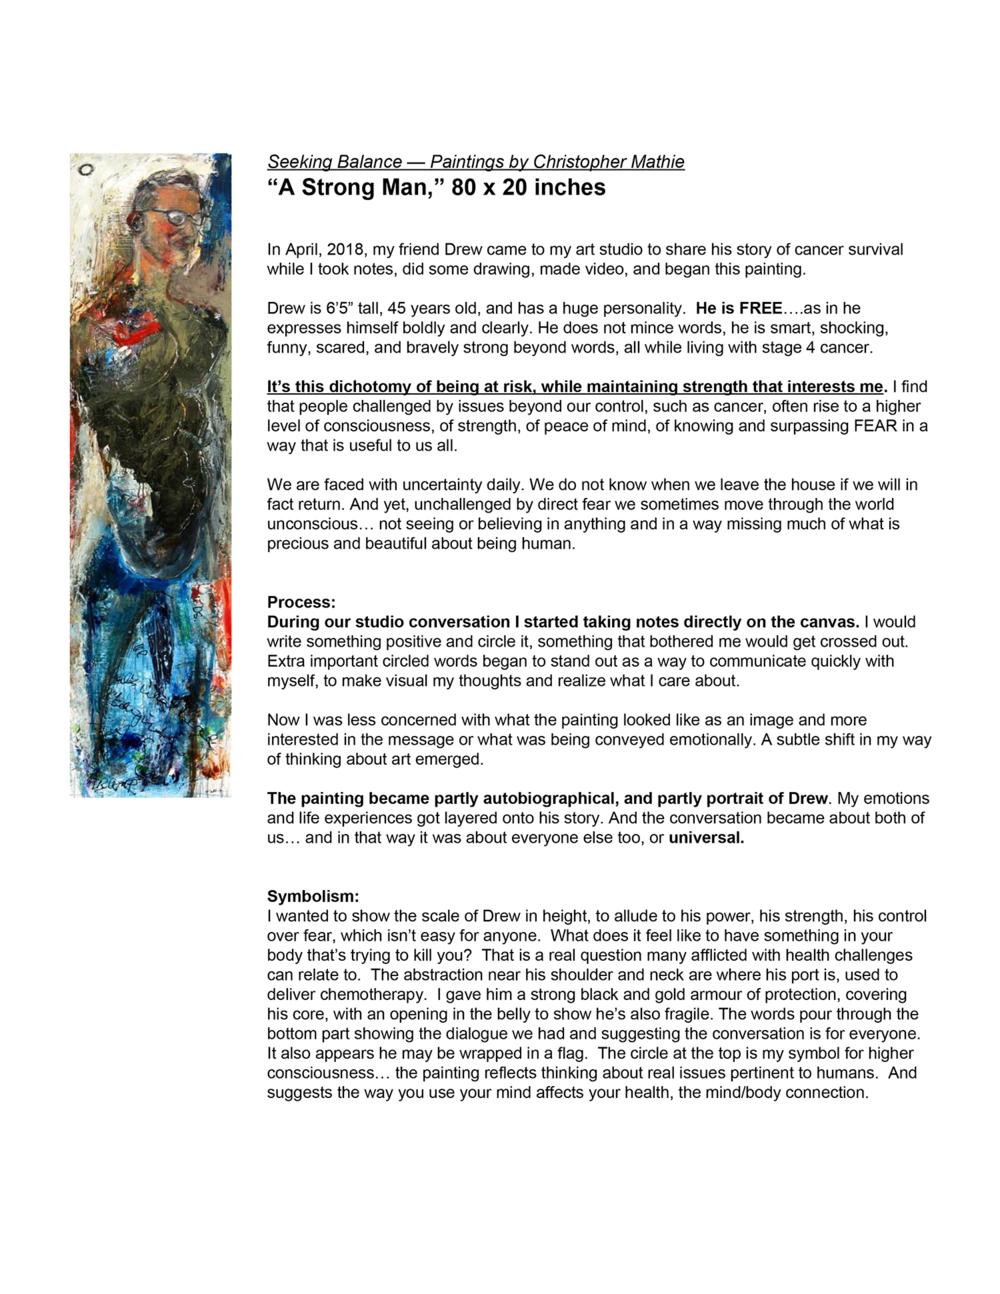 A_Stong_Man_Mathie_2018_Writing-2.png